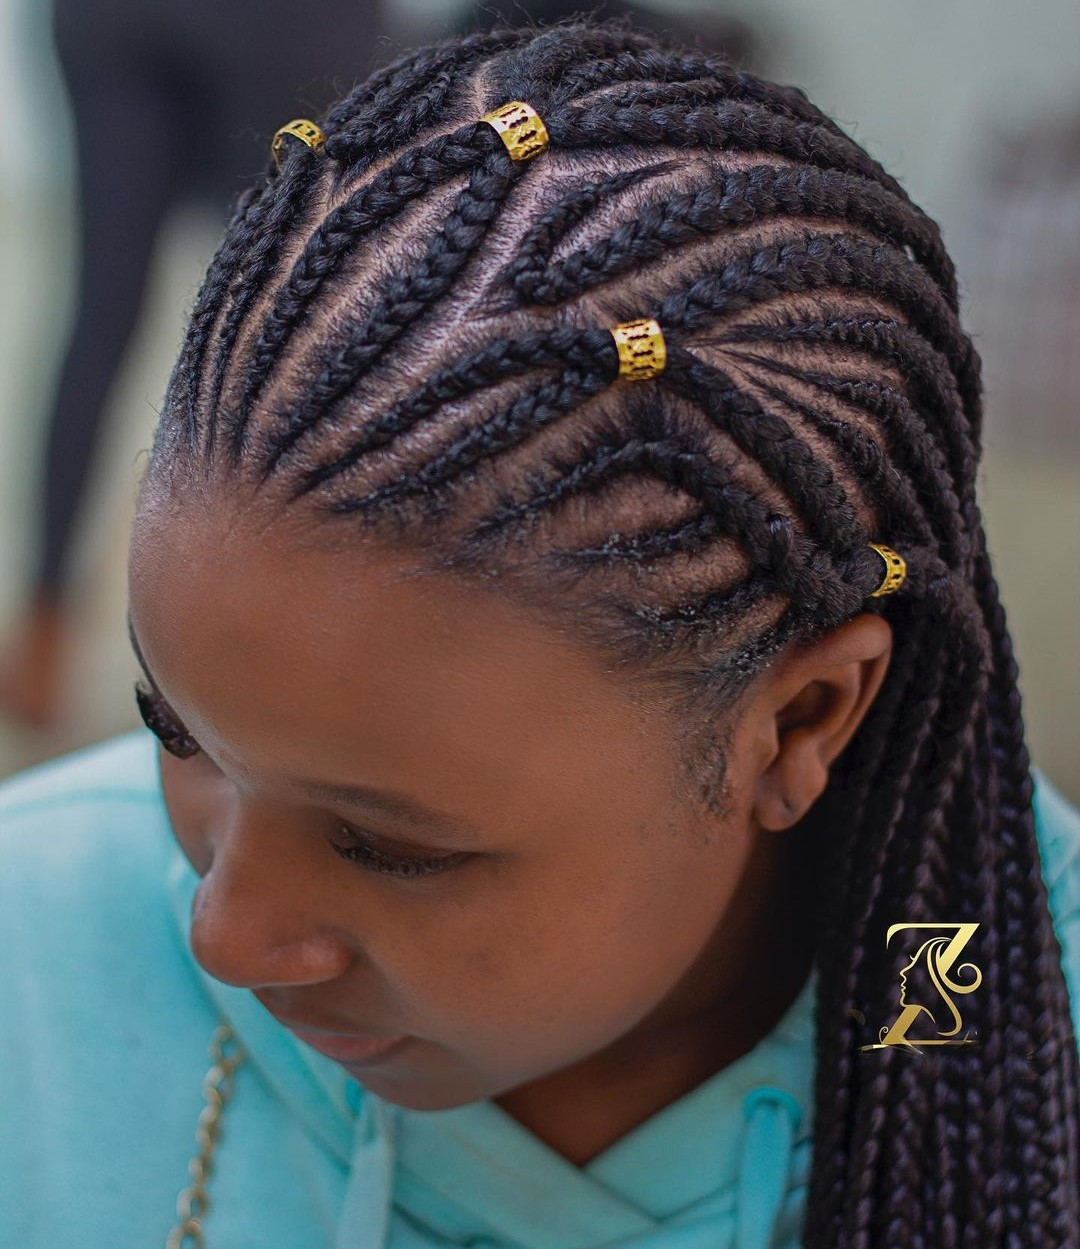 Stylish Ghana Braids with Cuffs